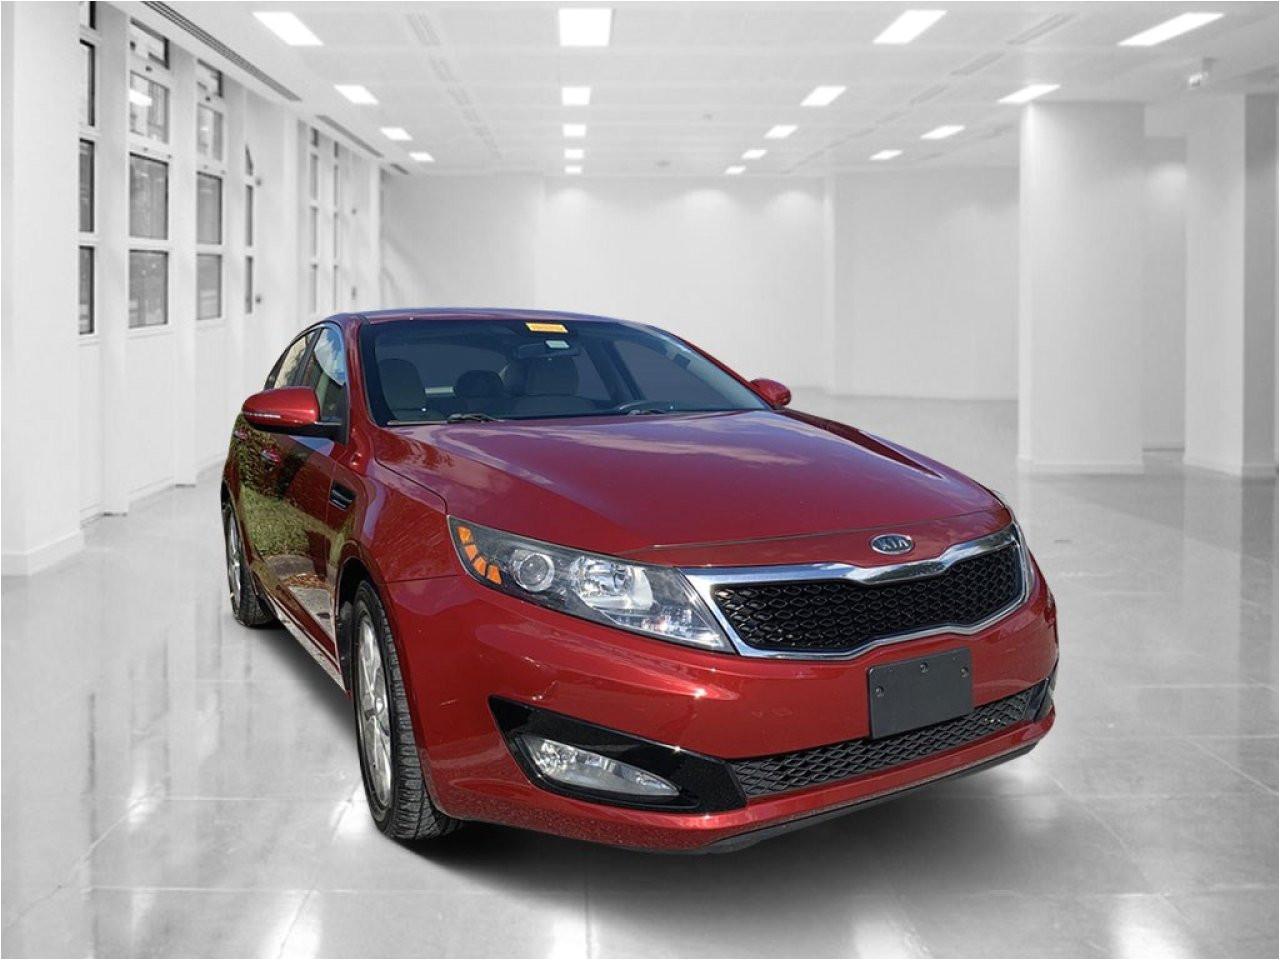 Kia Dealer In north Port Florida 2012 Kia Optima Lx 5xxgm4a74cg063126 orlando Kia north Longwood Fl